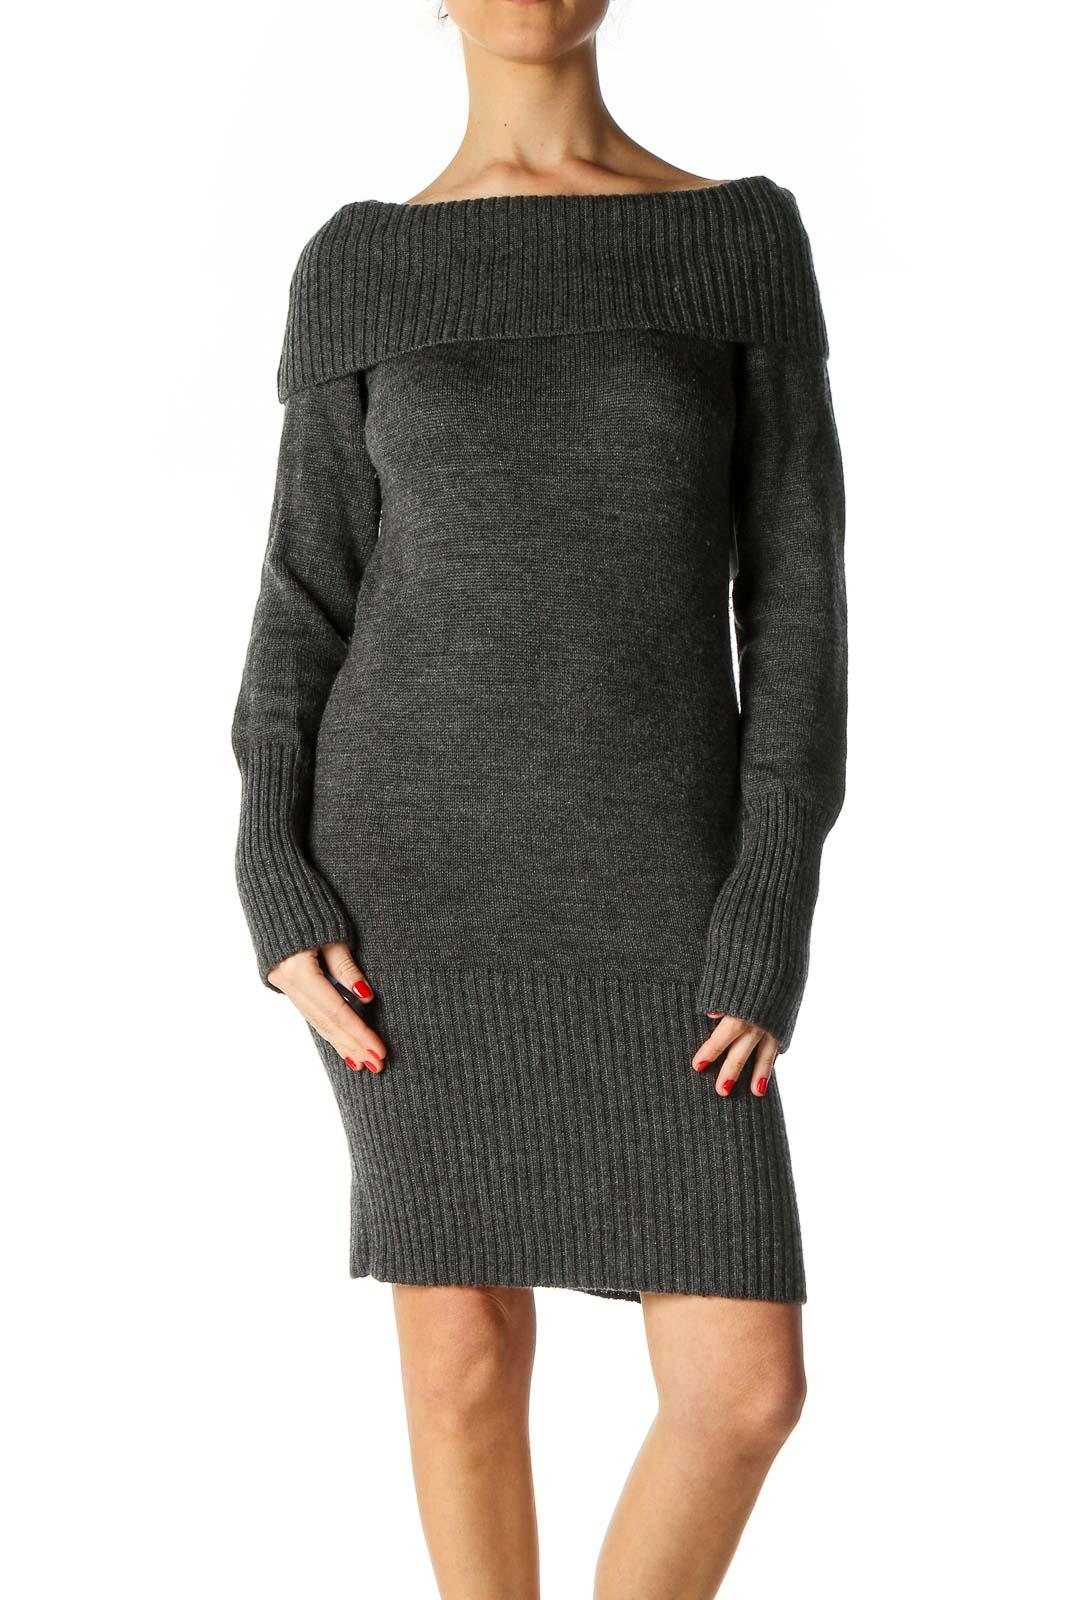 Gray Textured Sheath Dress Front